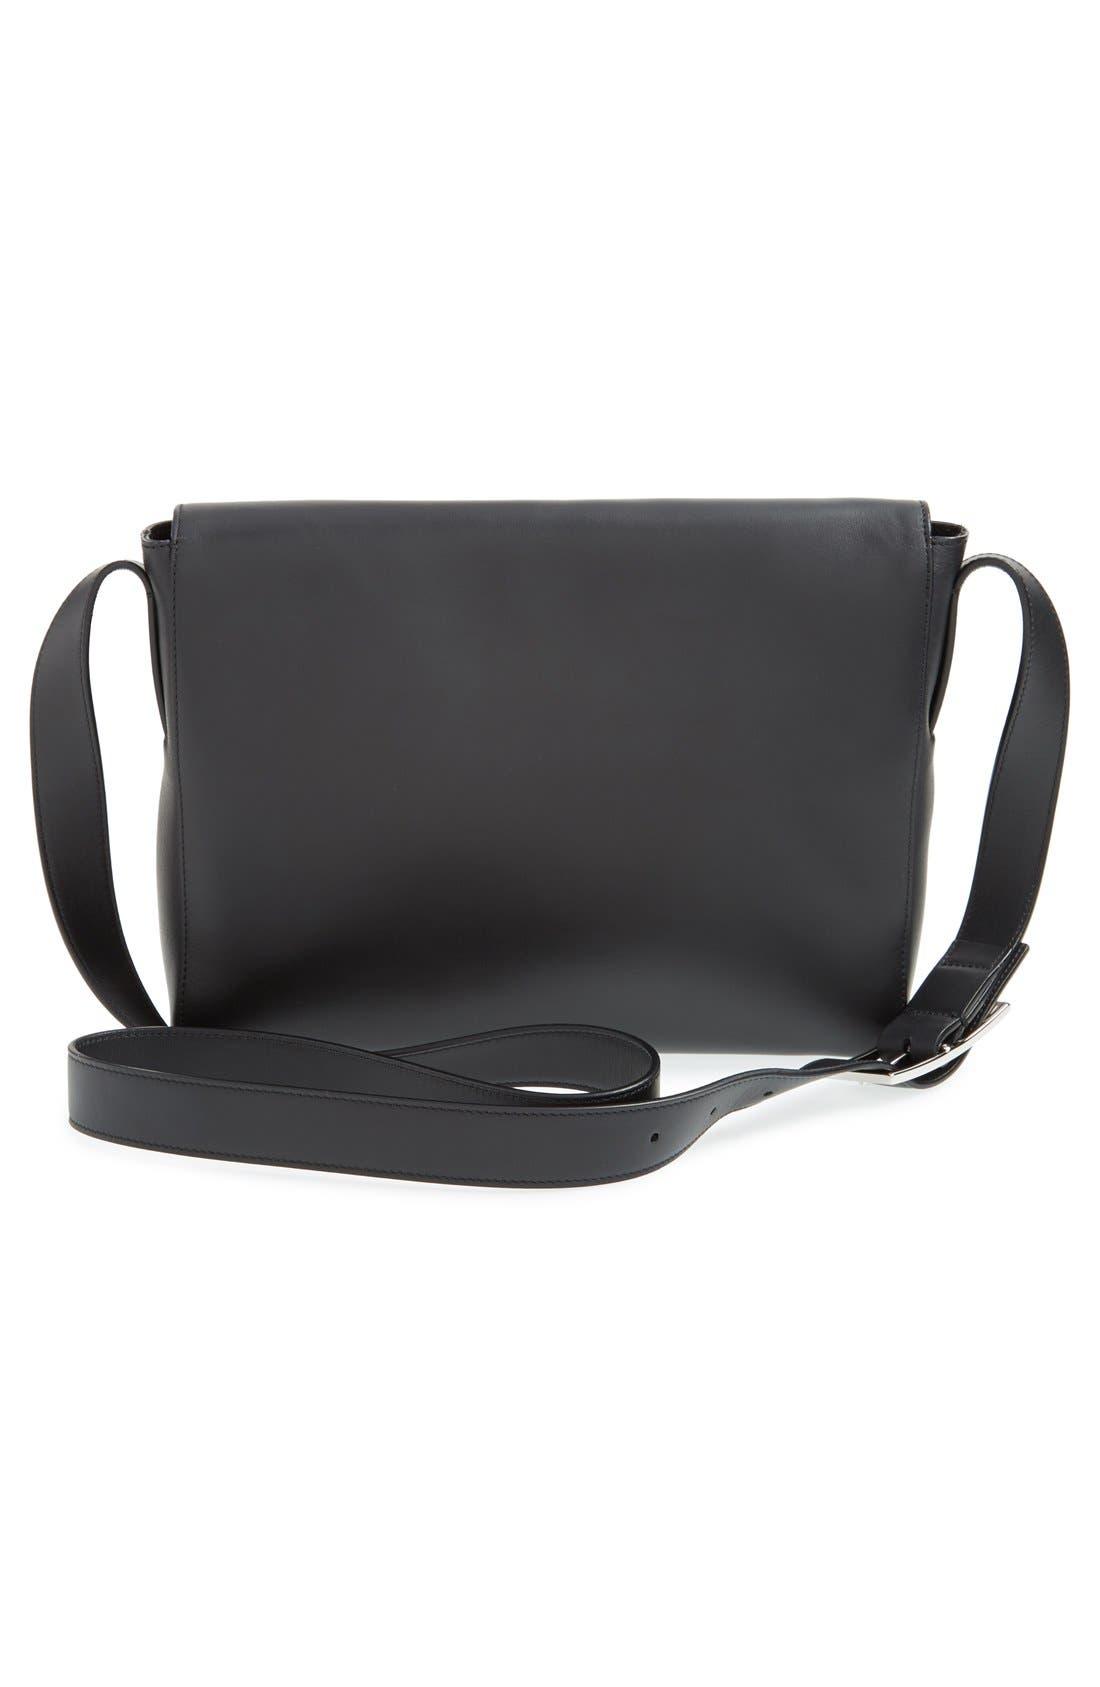 'Signature Collection - Medium' Leather Messenger Bag,                             Alternate thumbnail 2, color,                             001